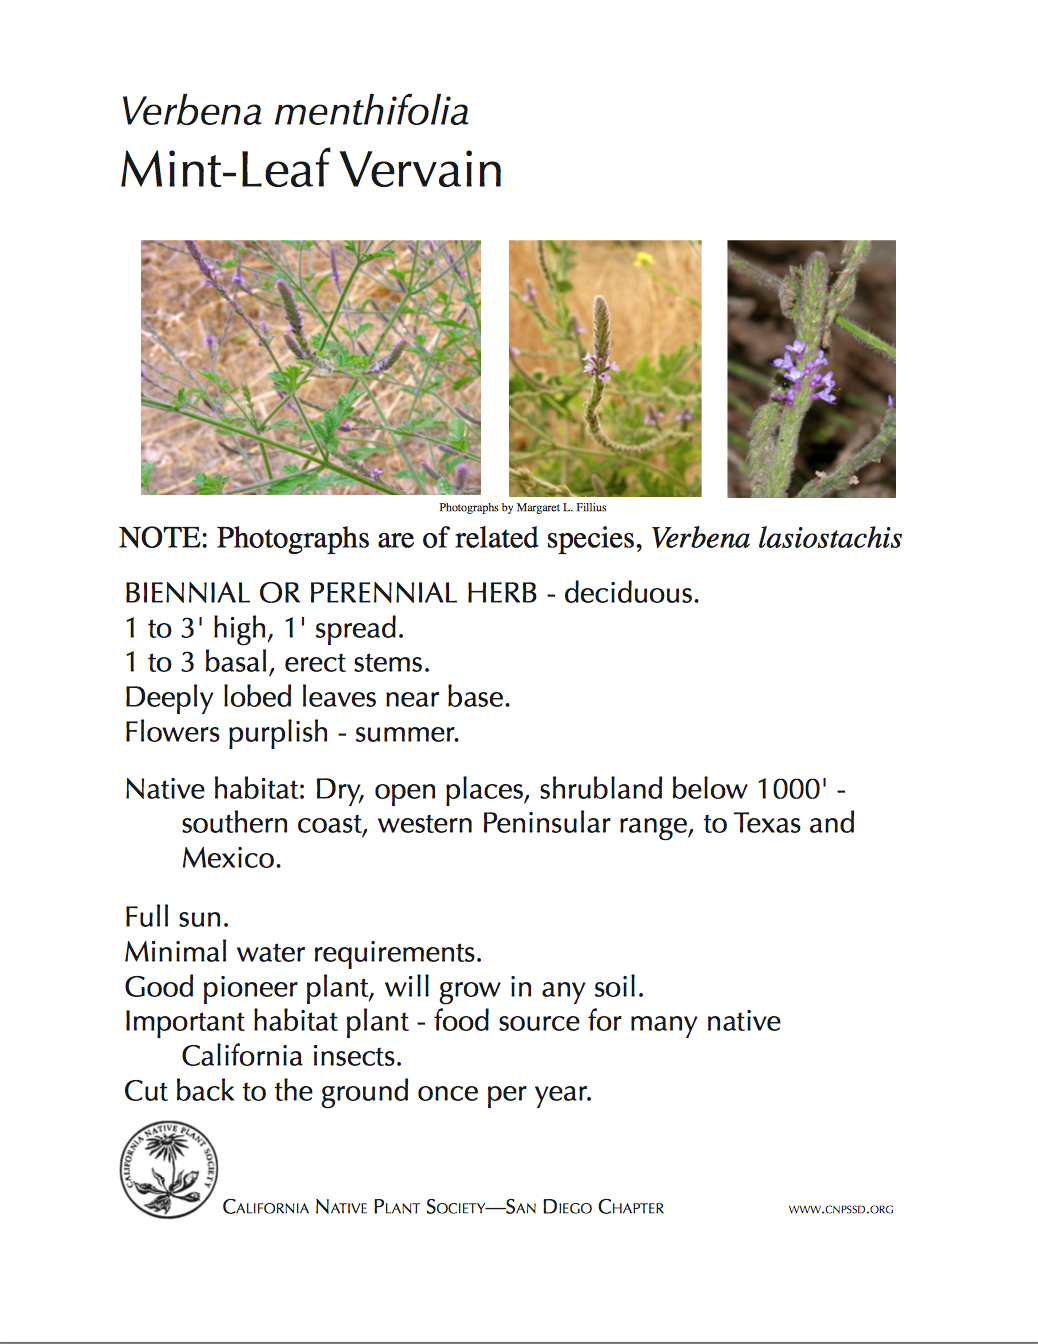 Verbena menthifolia.png